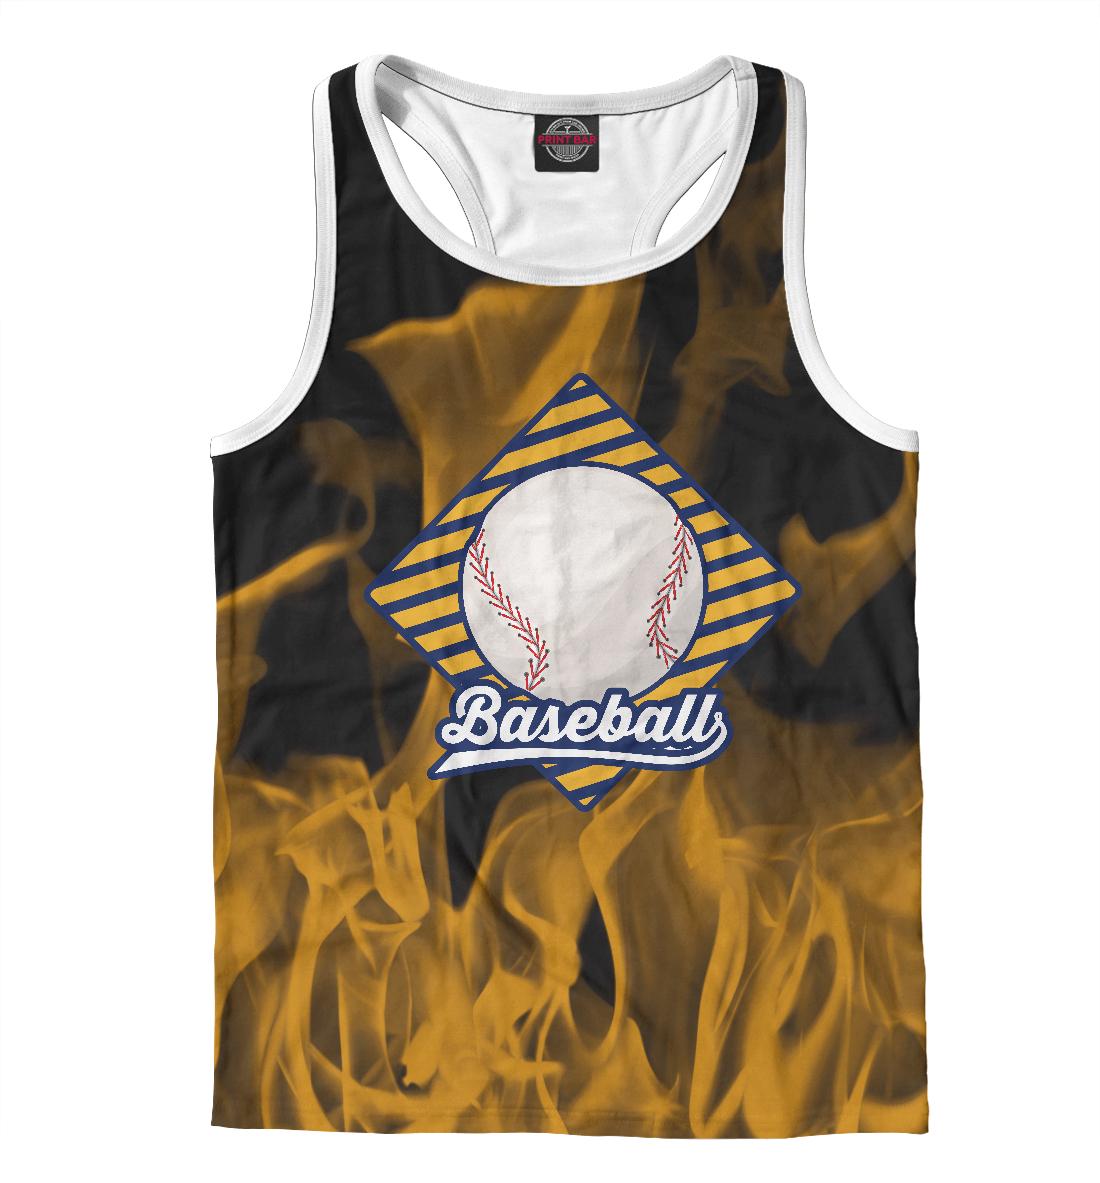 Купить Огненный бейсбол, Printbar, Майки борцовки, APD-835216-mayb-2